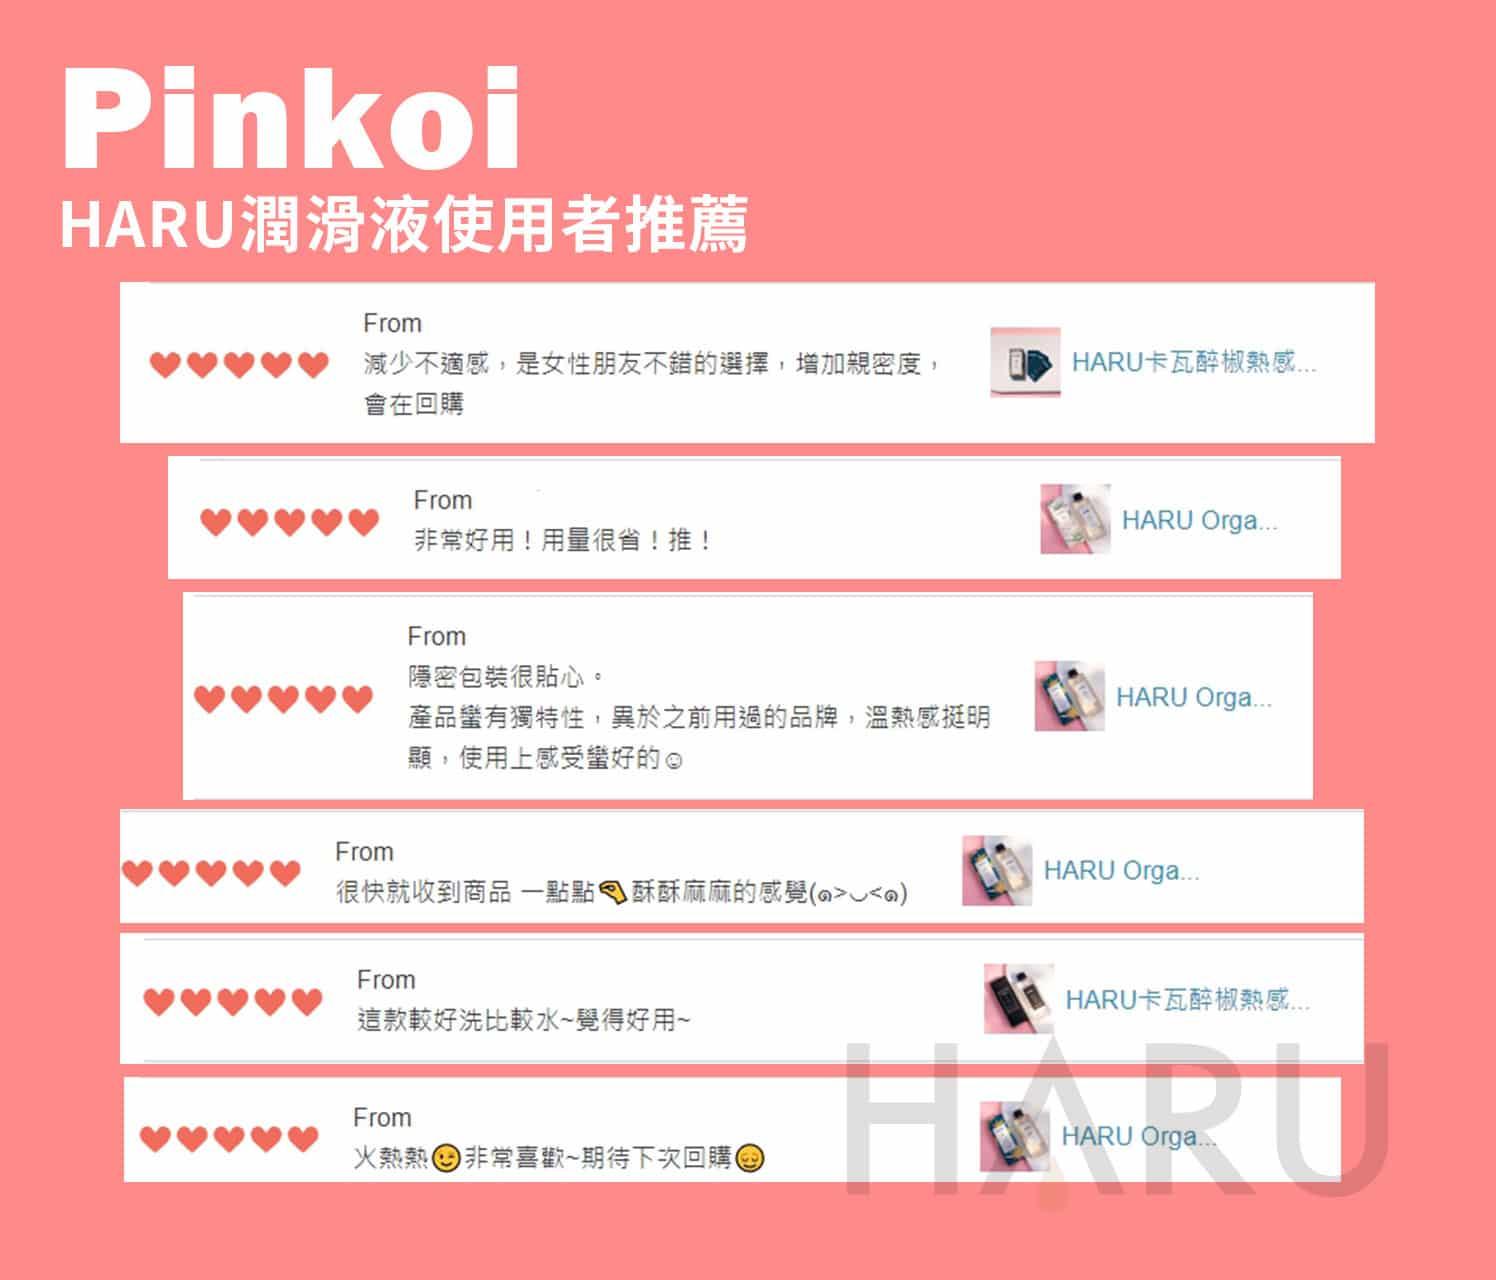 Pinkoi推薦的HARU水性潤滑液怎麼用